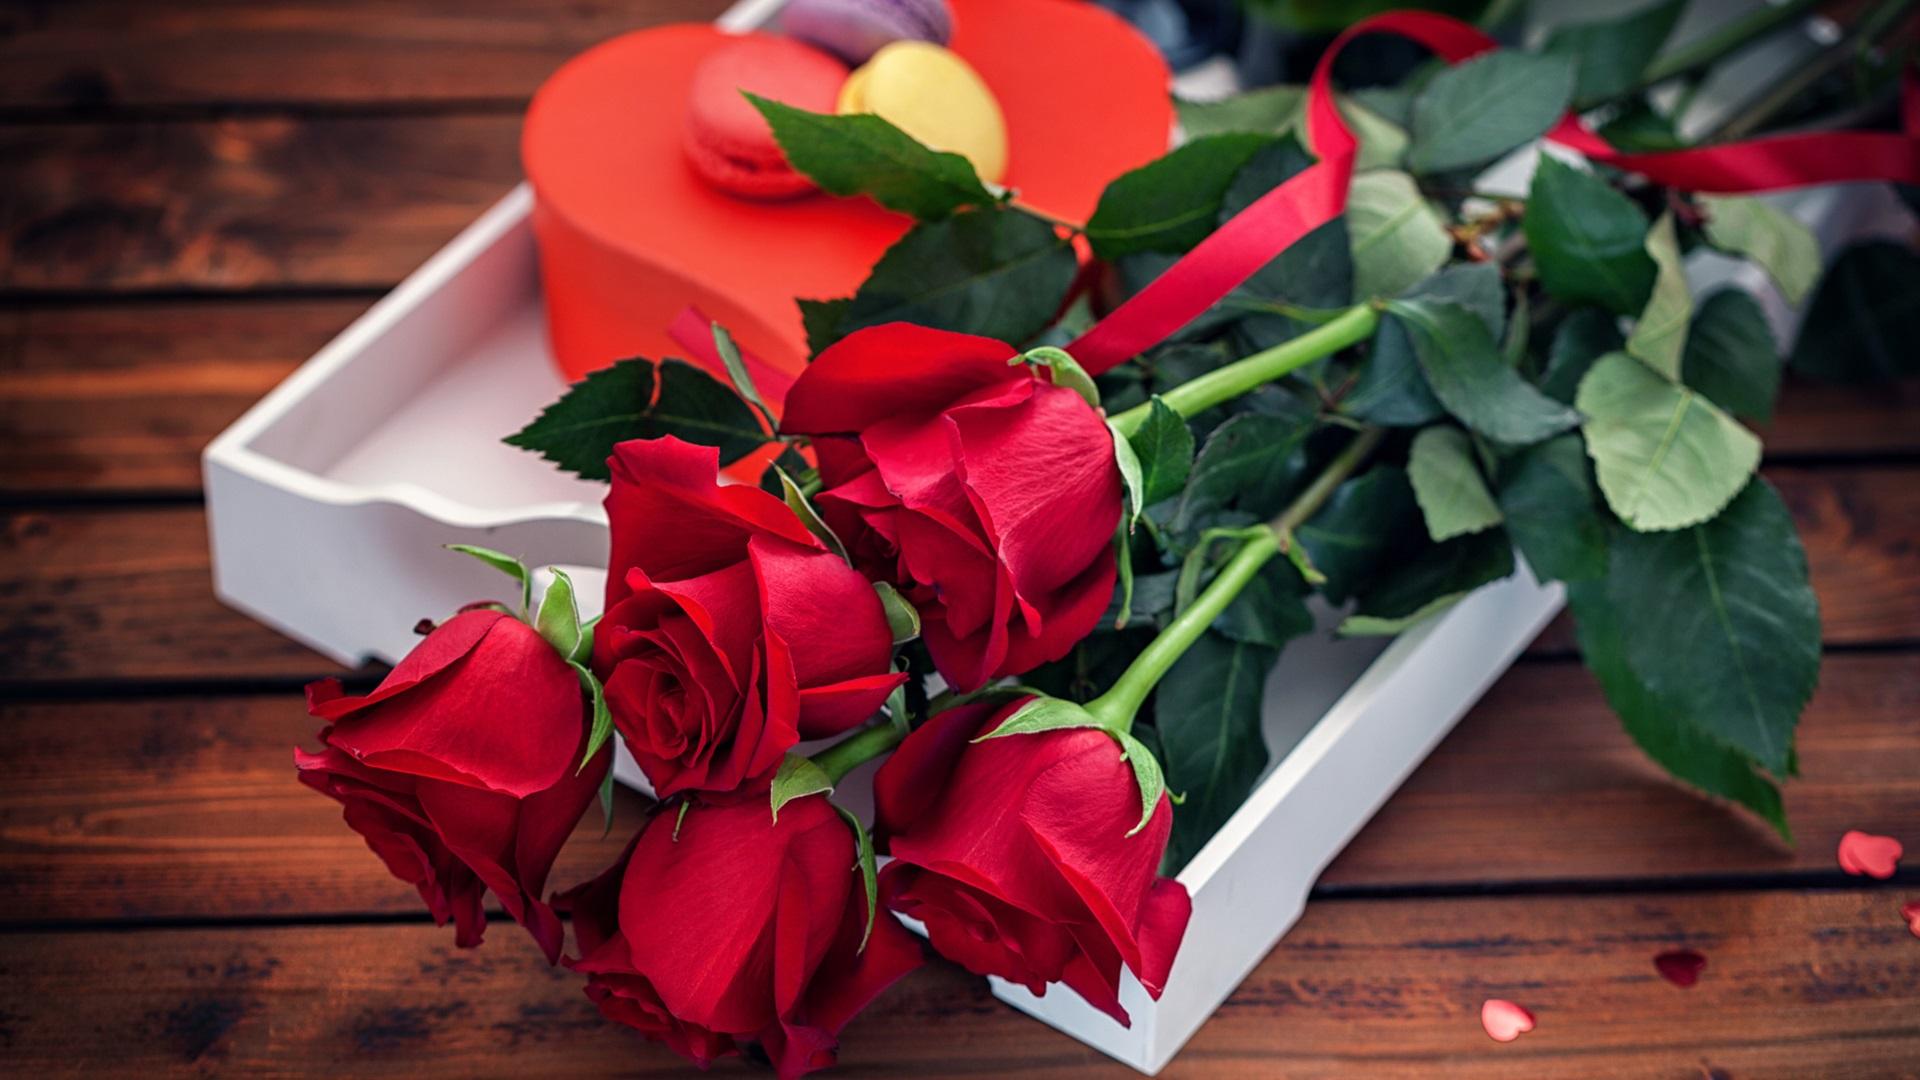 Flores rosa roja ramo regalo rom ntico fondos de for Bouquet de fleurs hd